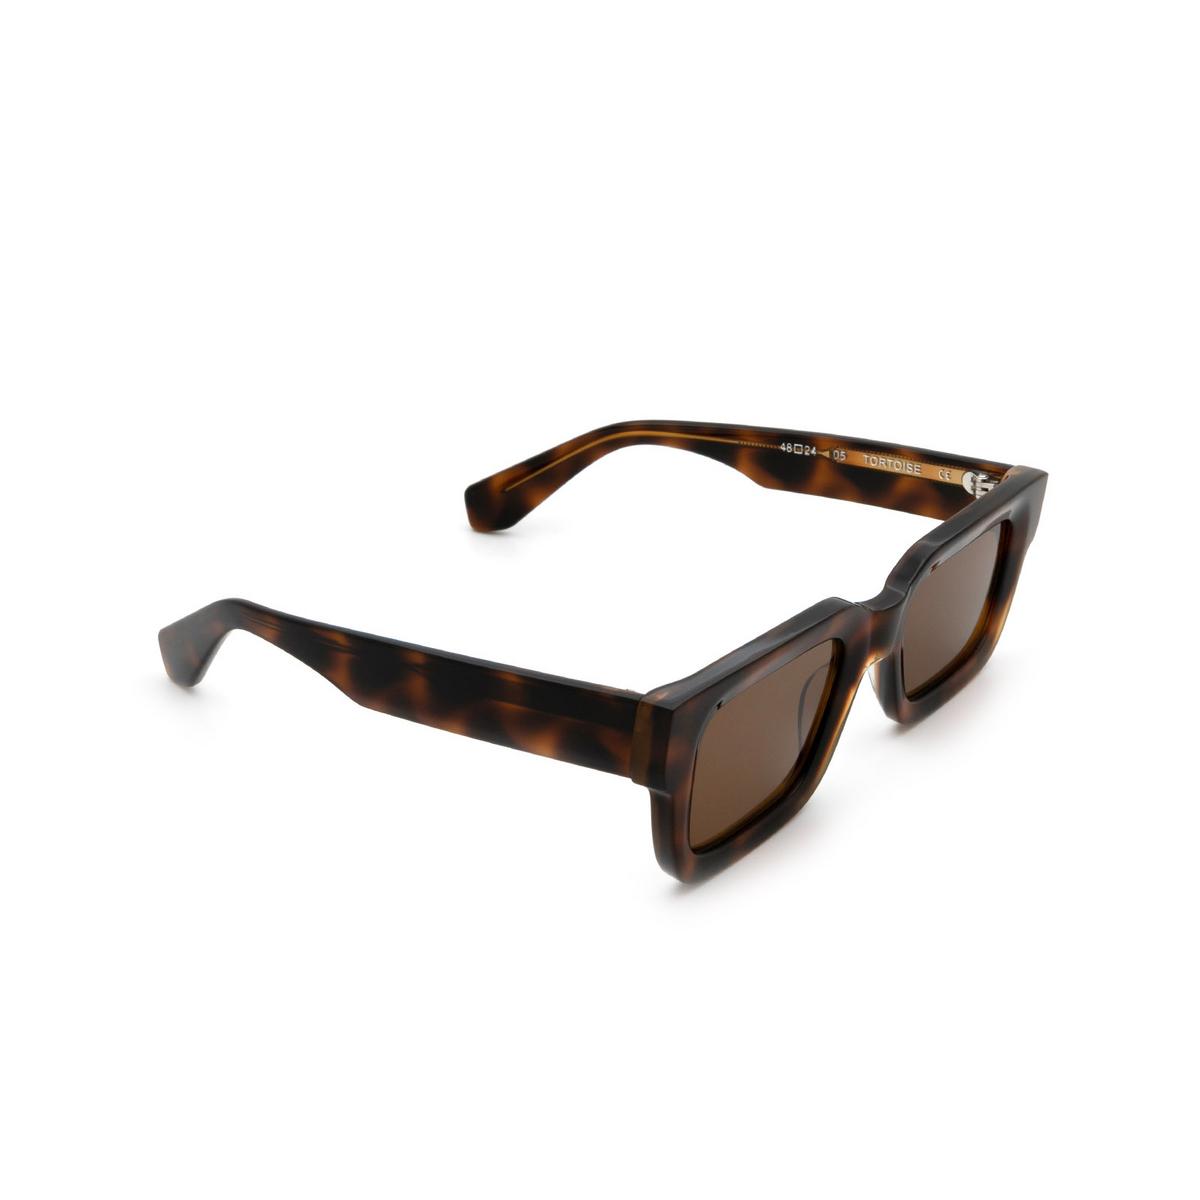 Chimi® Rectangle Sunglasses: 05 color Tortoise - three-quarters view.